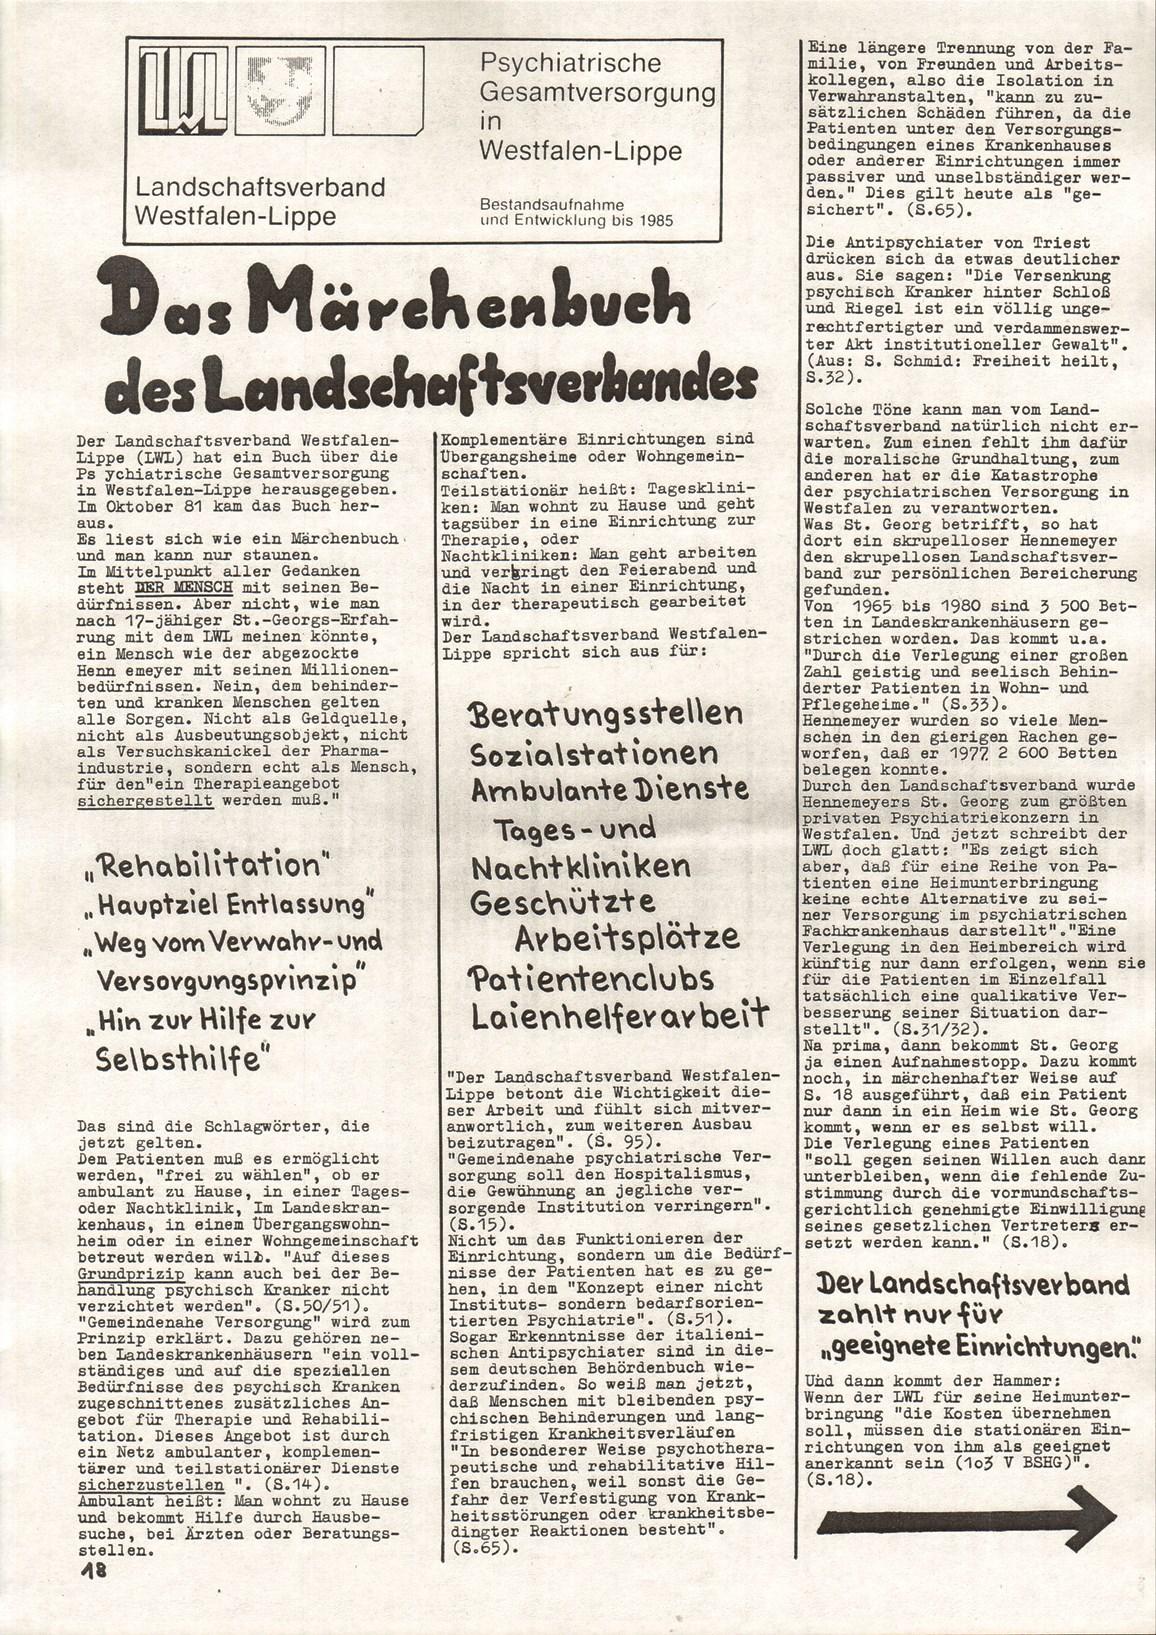 Gelsenkirchen_Selbsthilfe_Blatt_1983_02_18